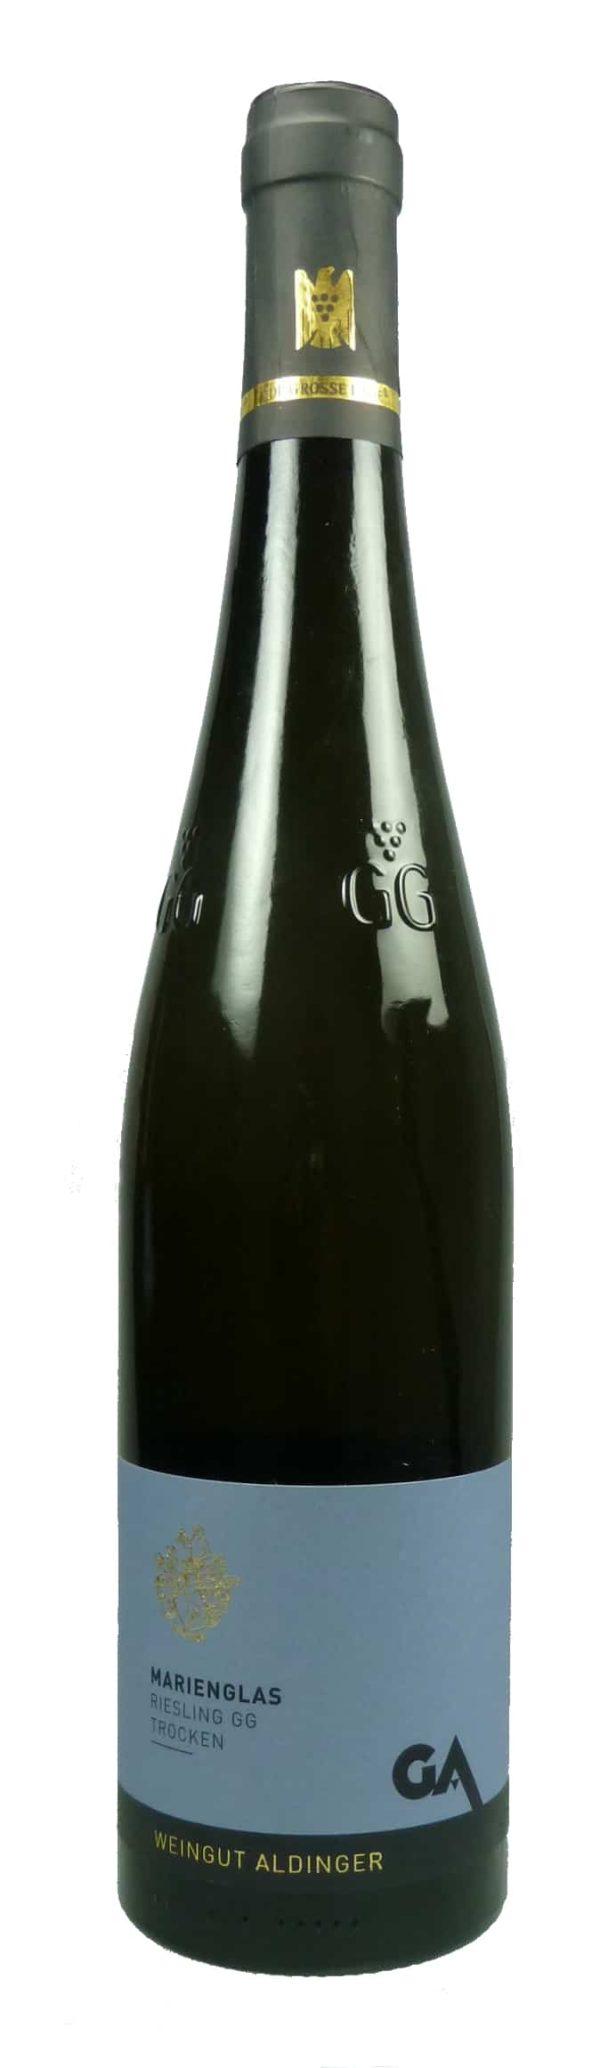 Marienglas Gips Riesling Großes Gewächs Qualitätswein trocken 2016